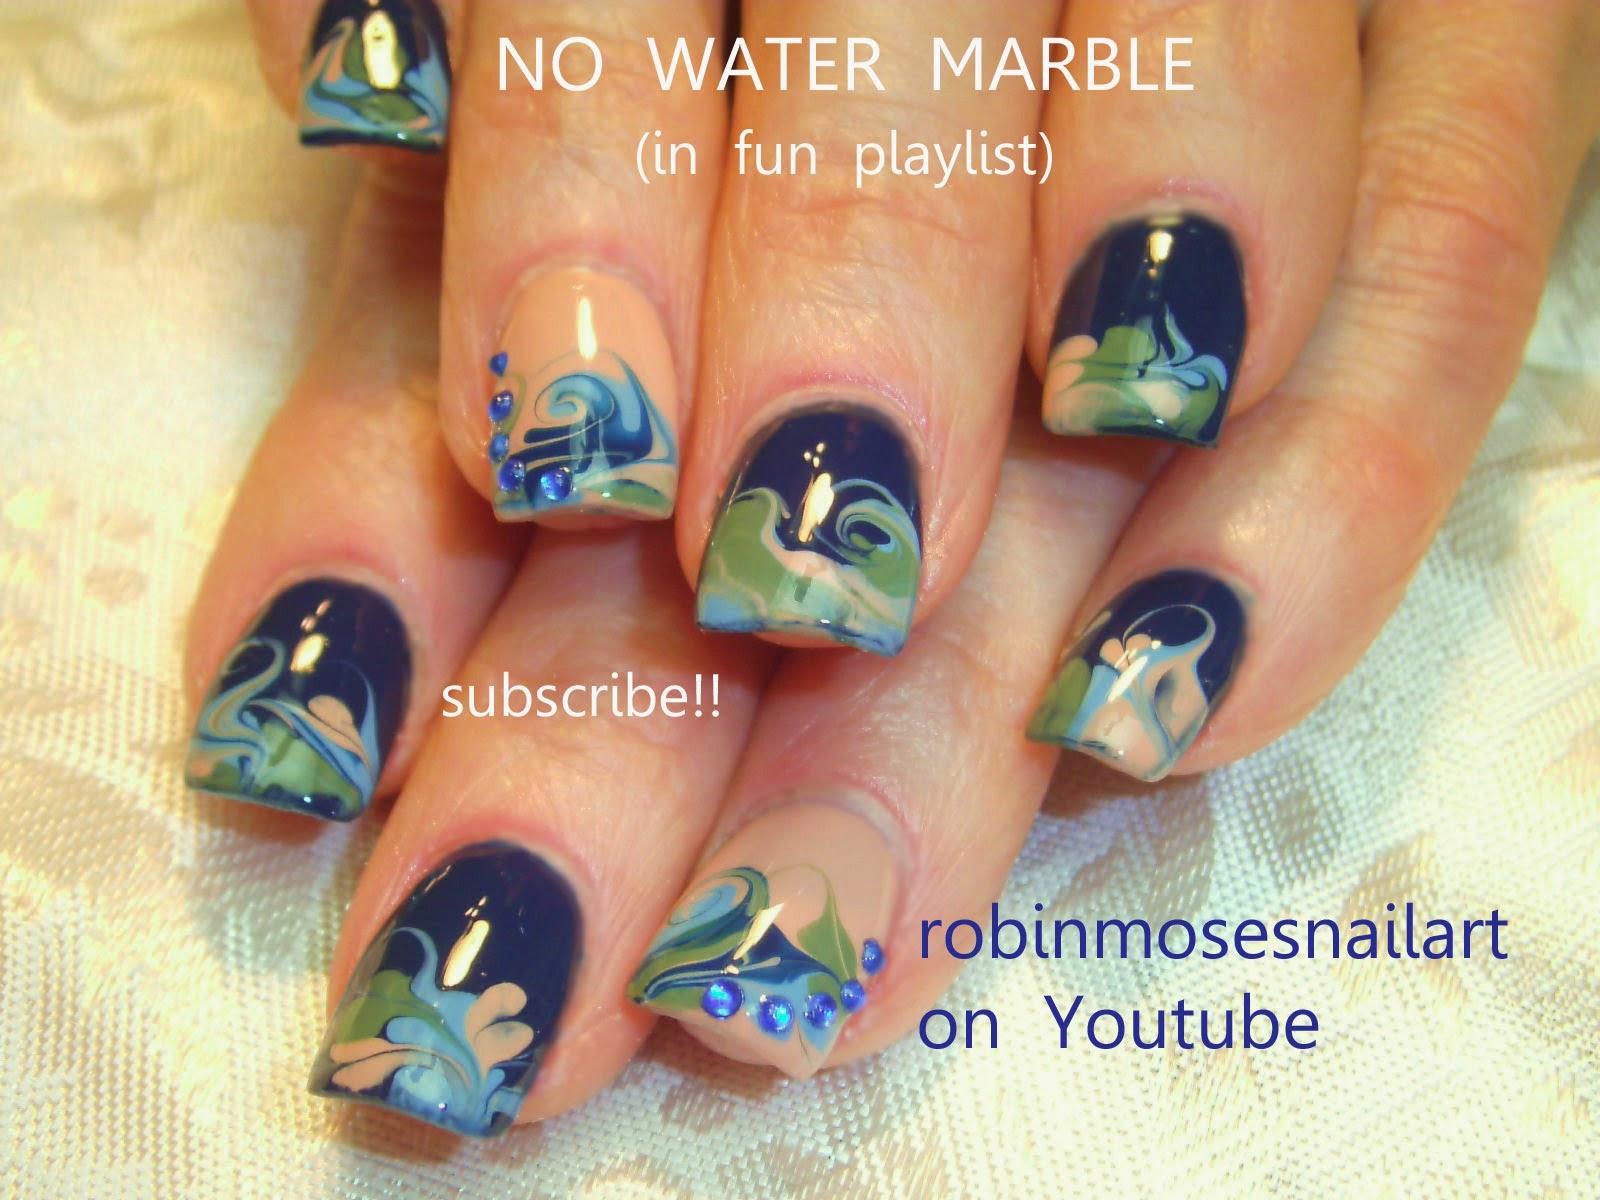 Nail art by robin moses april 2014 nail art elegant black tie formal wedding nails solutioingenieria Image collections